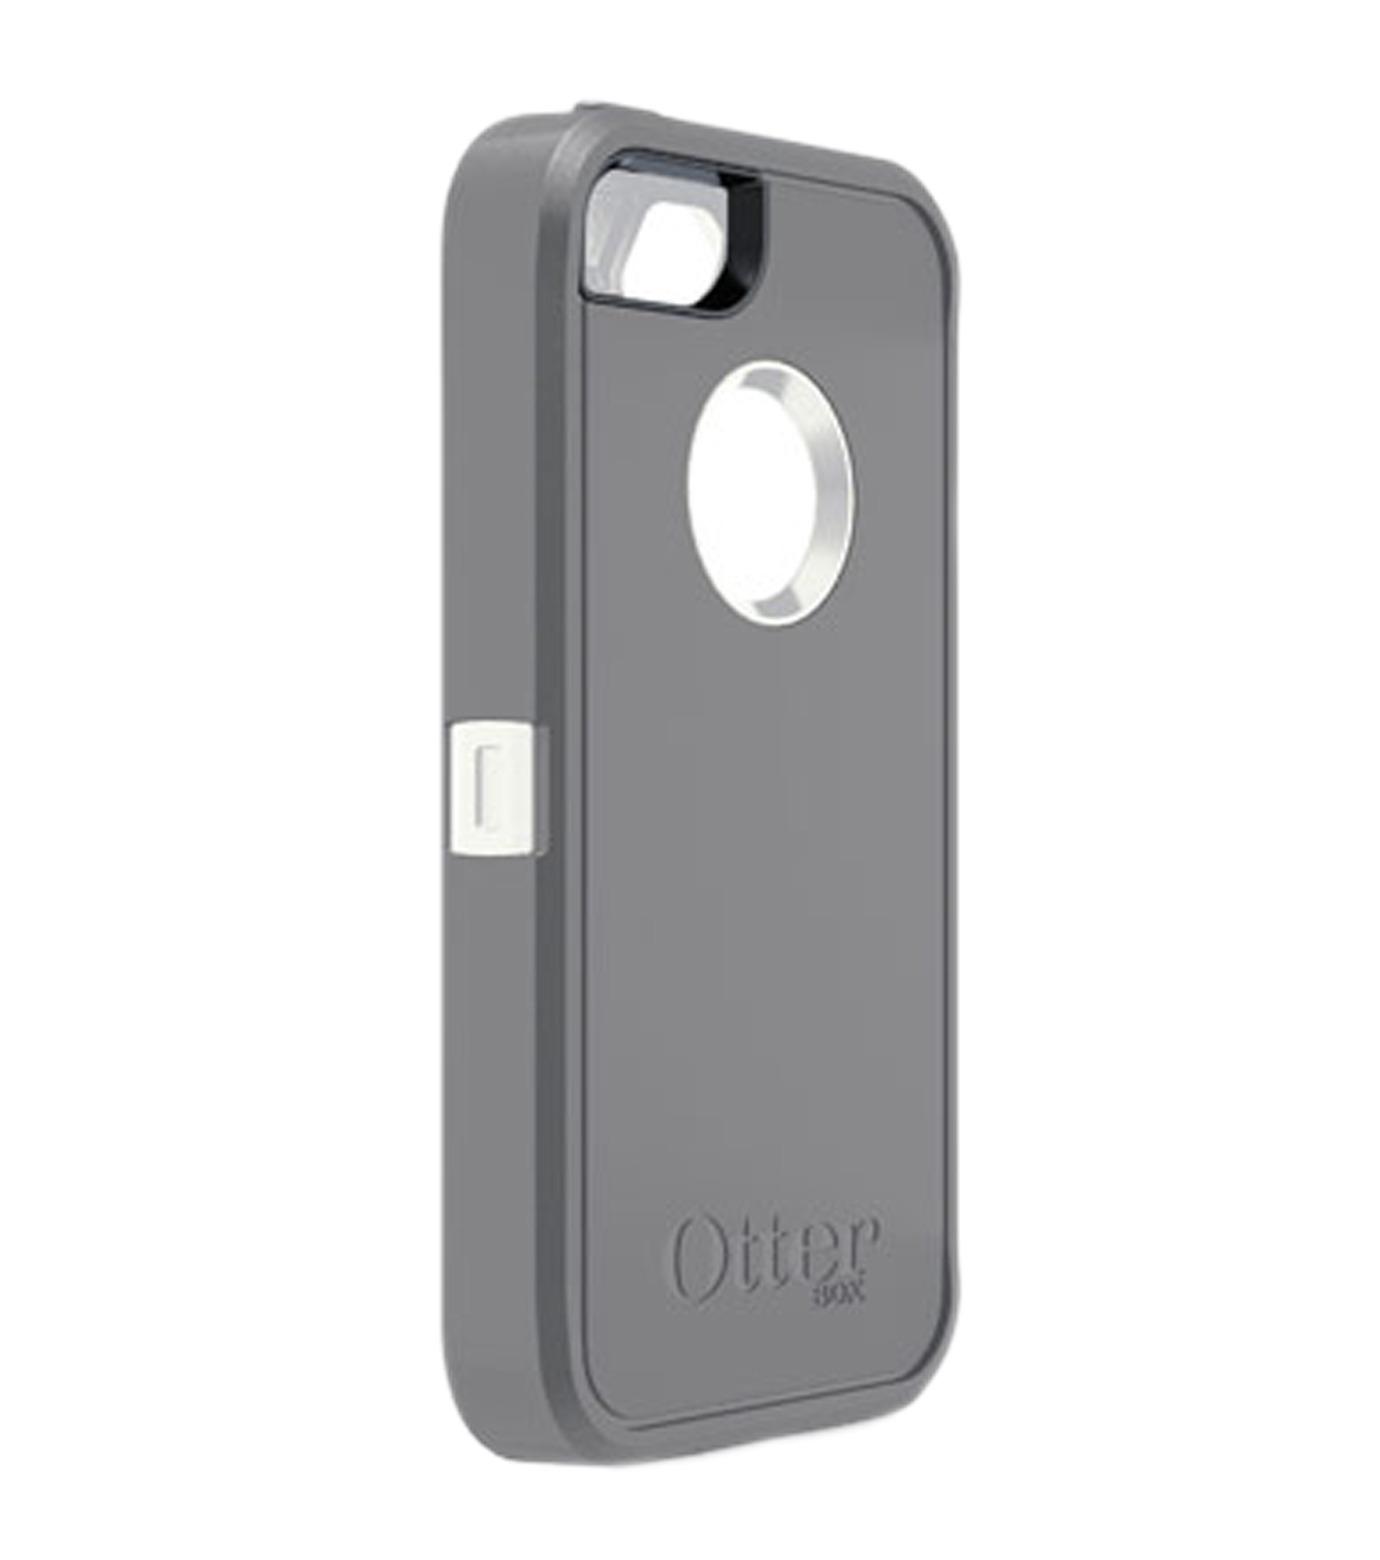 Tunewear(チューンウエア)のiPhone5 Case-GRAY-OTB-PH-013-11 拡大詳細画像1